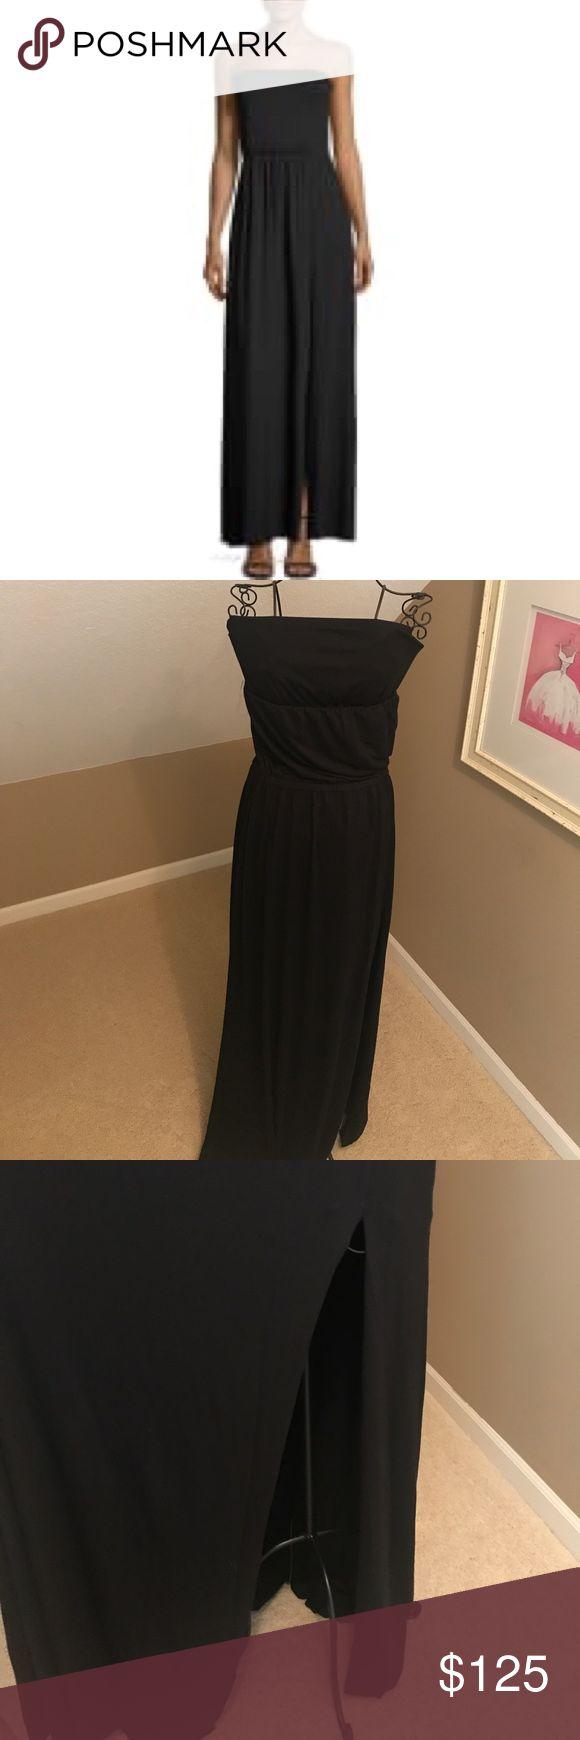 Rachel Pally Luletta Maxi Dress Brand New Rachel Pally Black Dress! 92% Modal 8% Spandex Rachel Pally Dresses Maxi